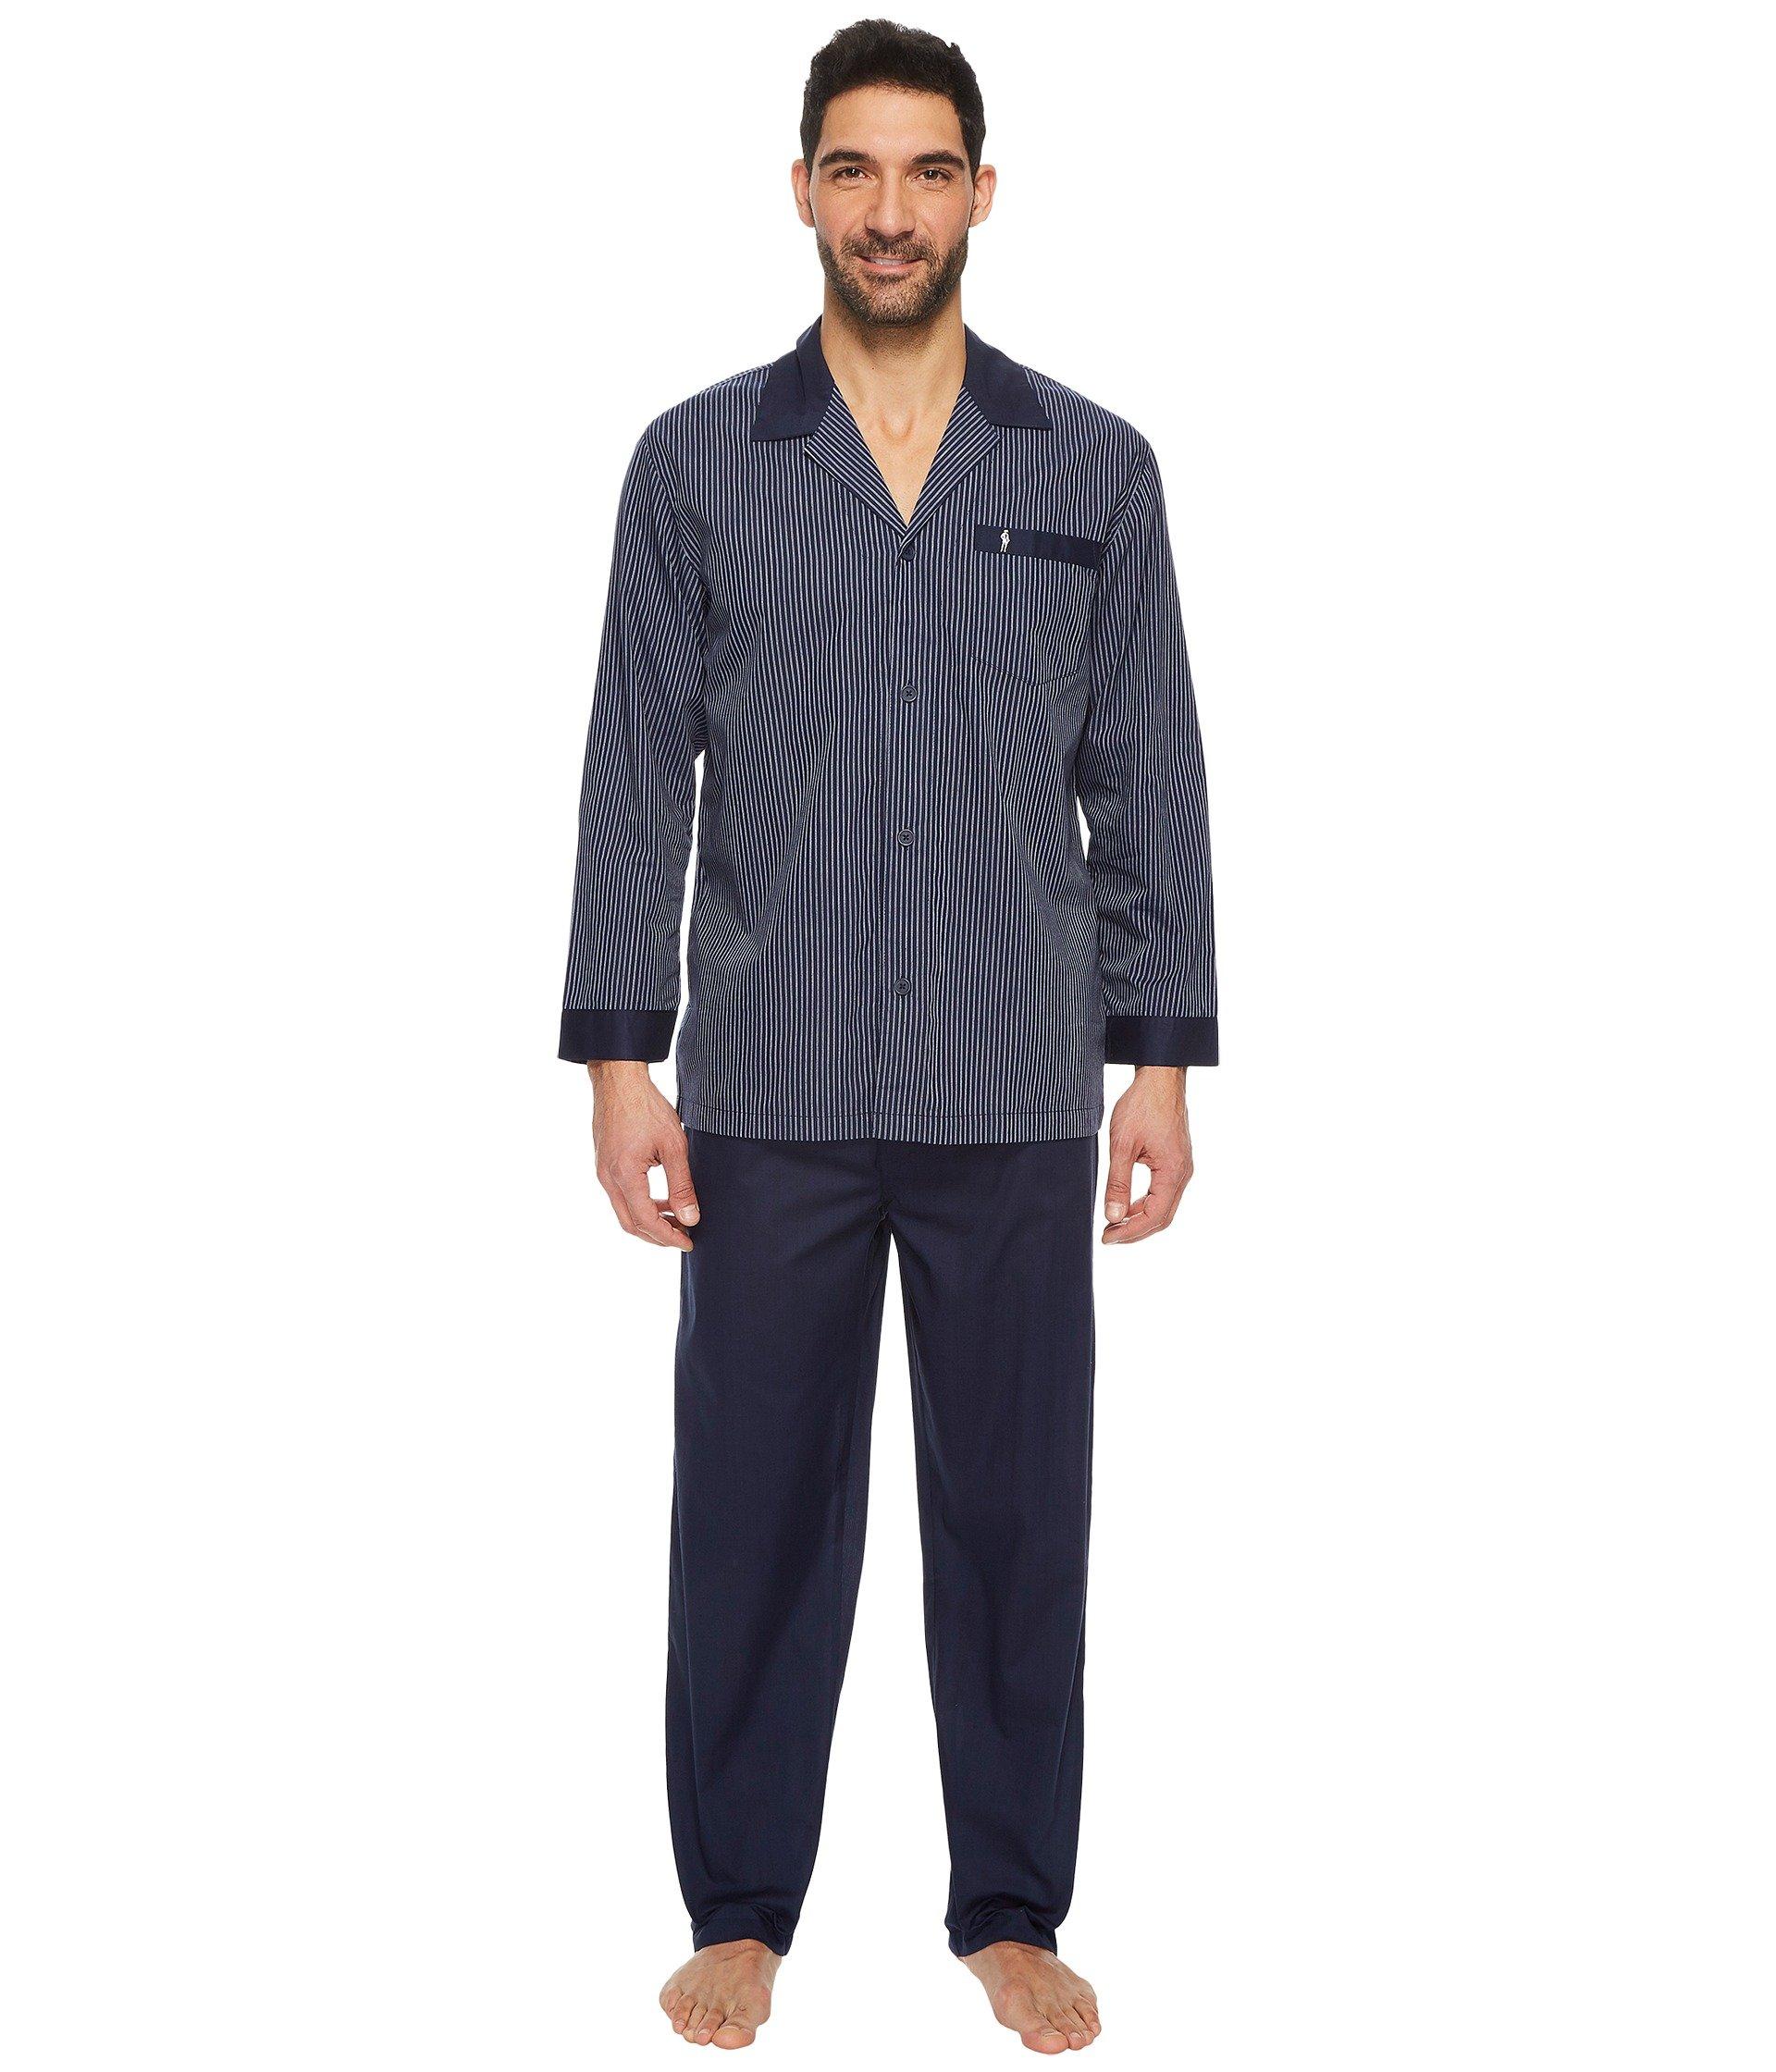 Pijama para Hombre Jockey Broadcloth Pajamas Set  + Jockey en VeoyCompro.net